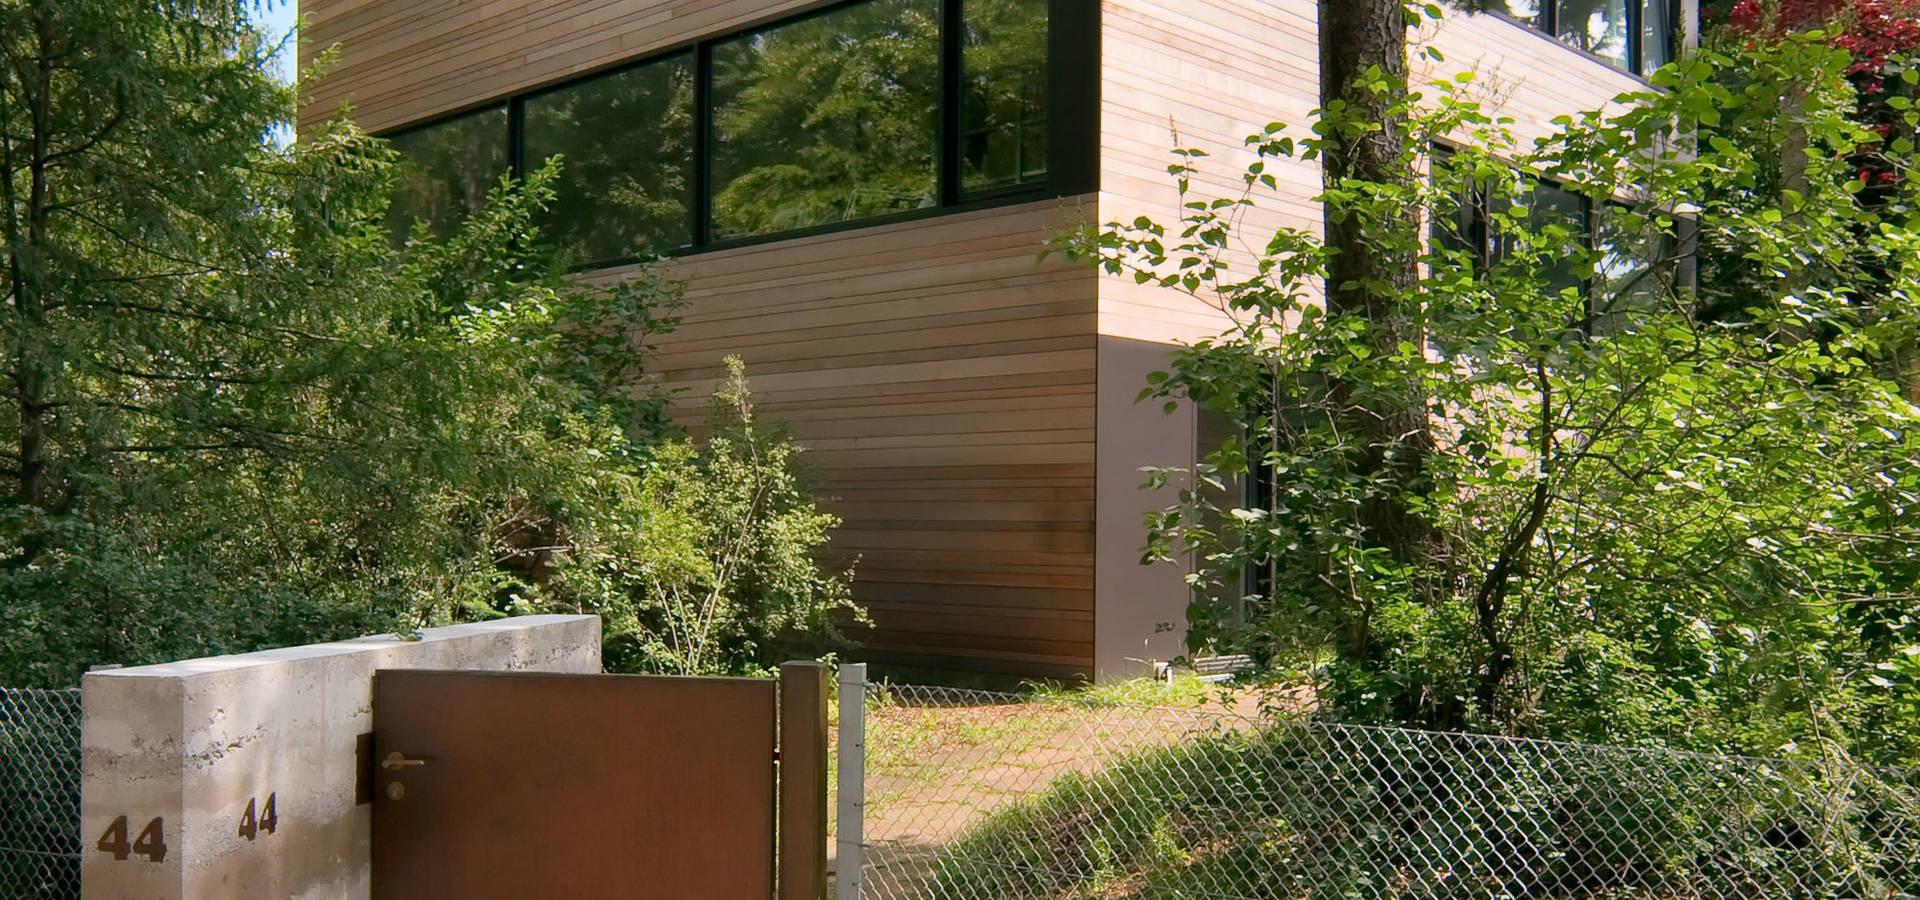 Holzhaus wohnhaus tsingas niedrigenergiehaus de helm for Holzhaus wohnhaus